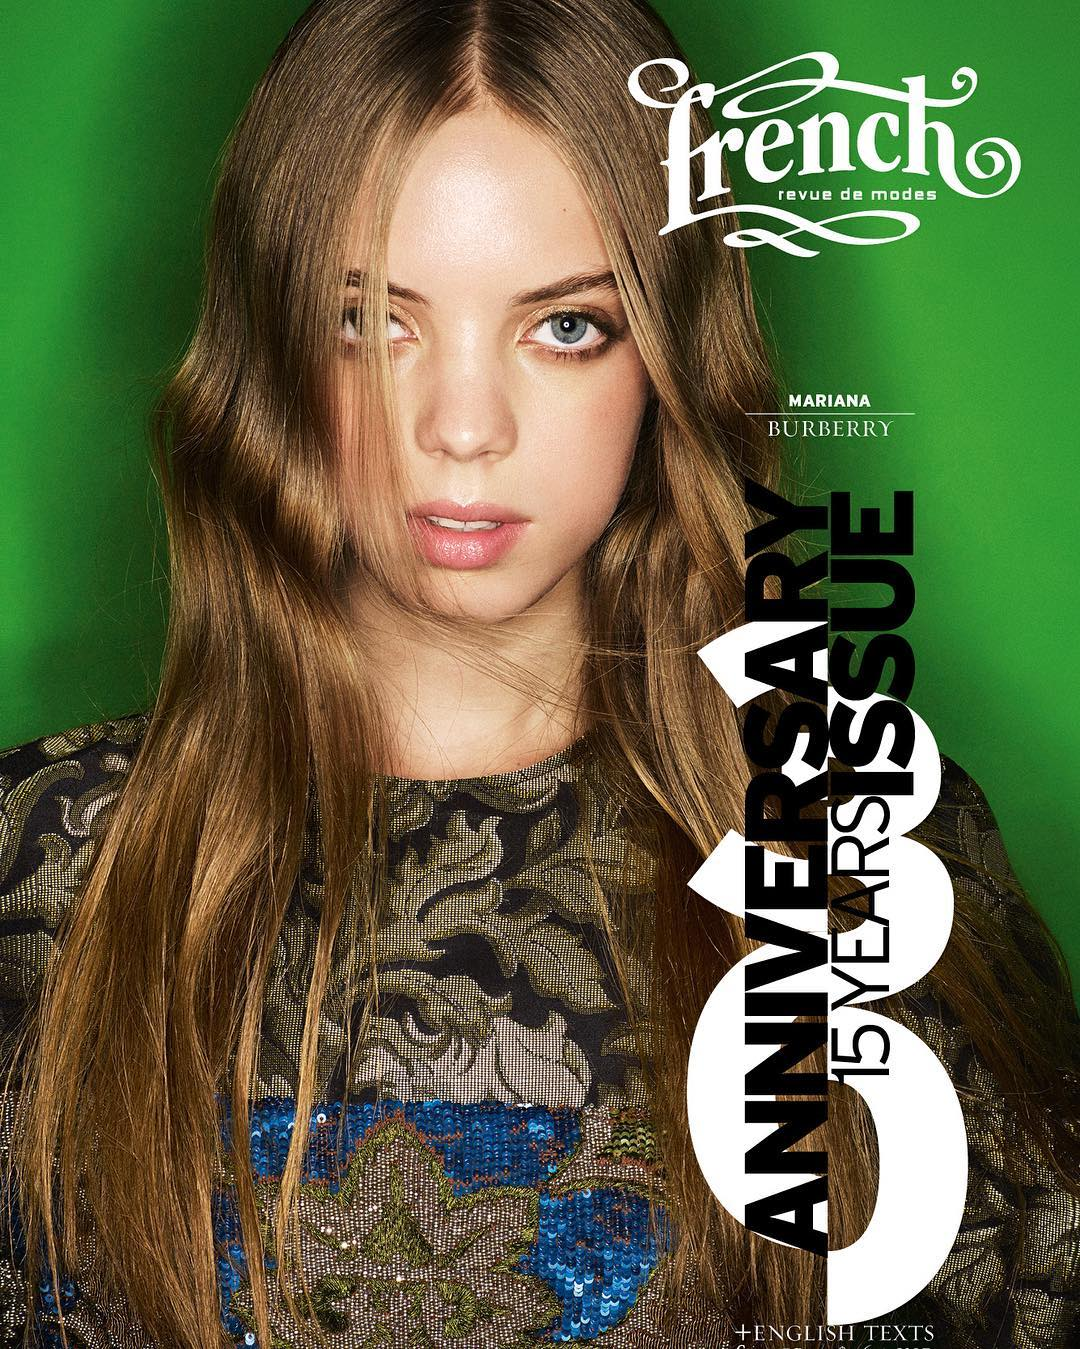 Mariana Zaragoza covers French Revue de Modes No. 30